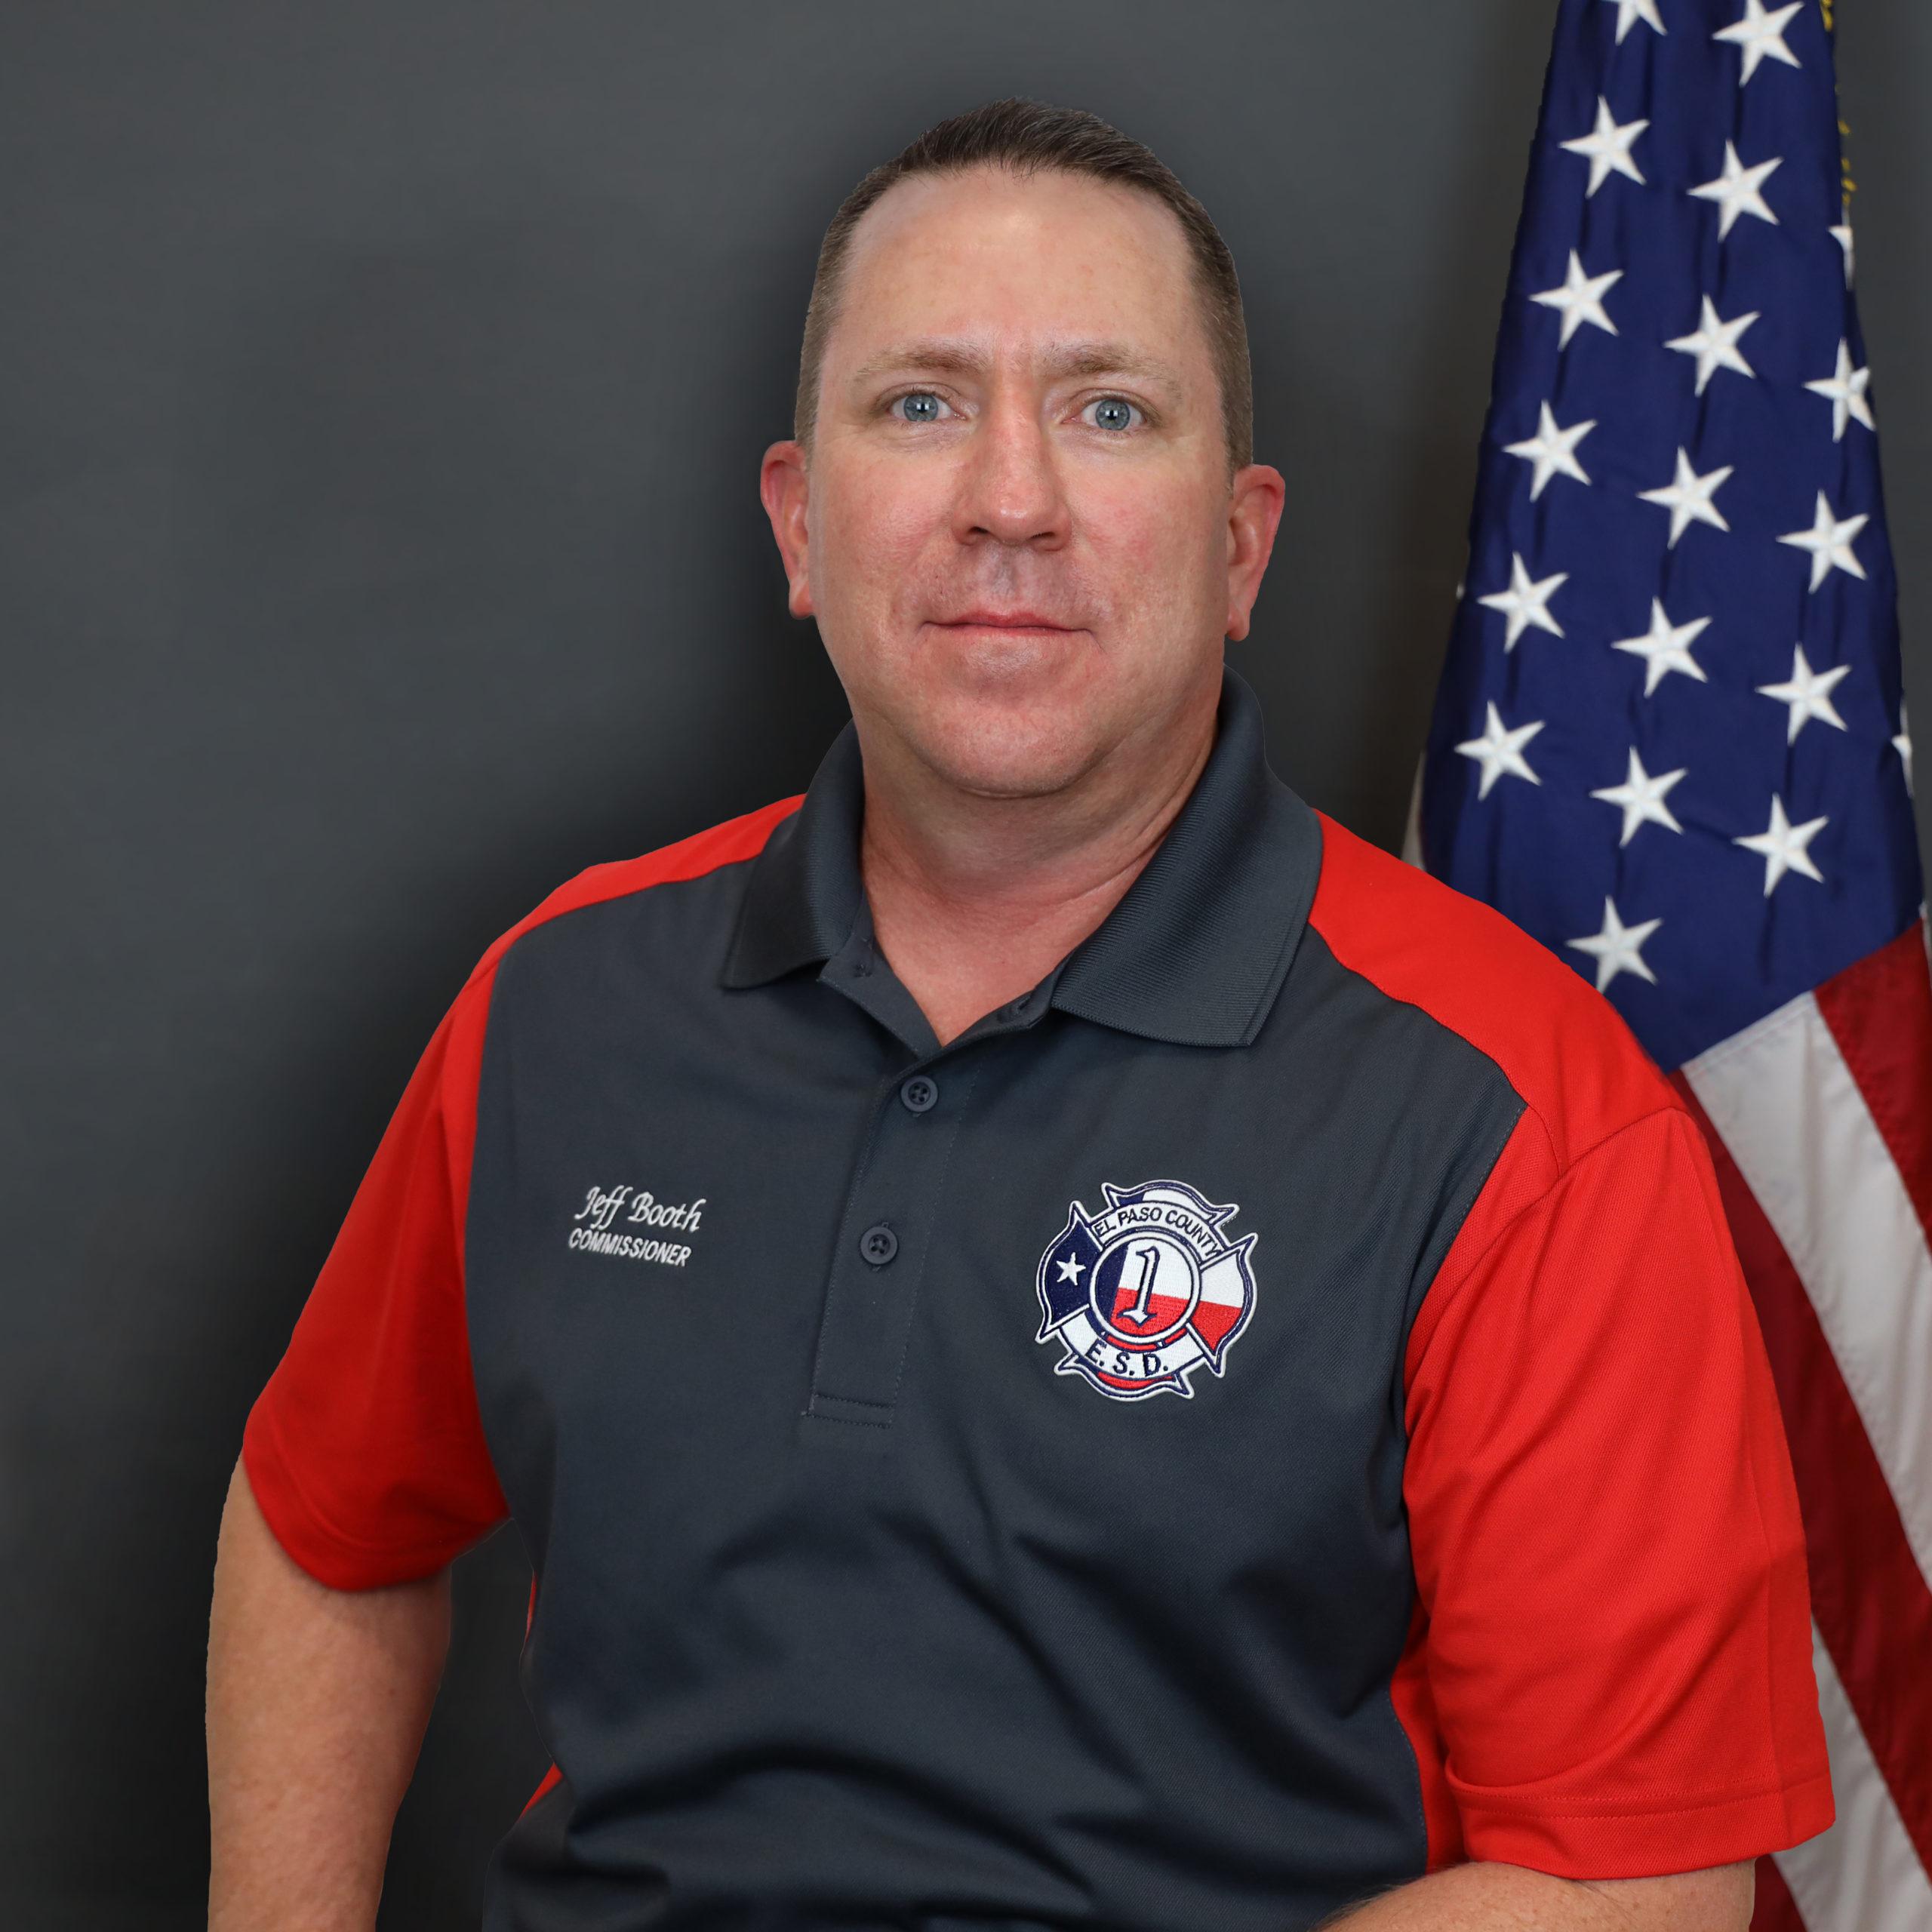 Jeff Booth - Secretary